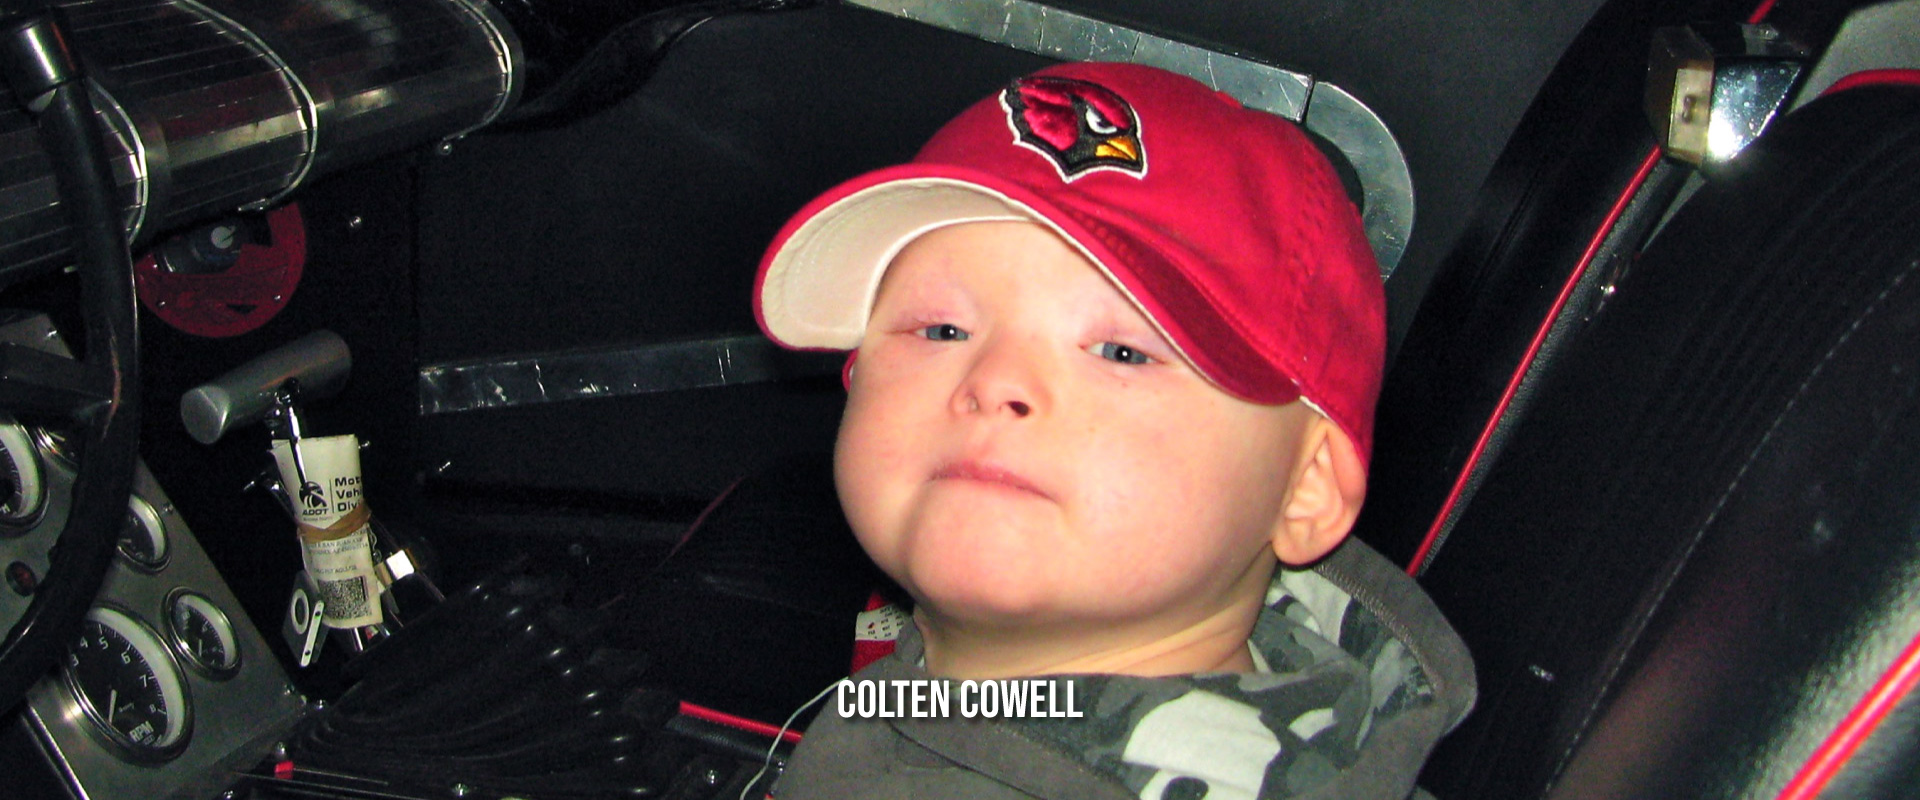 Colten Cowell Foundation